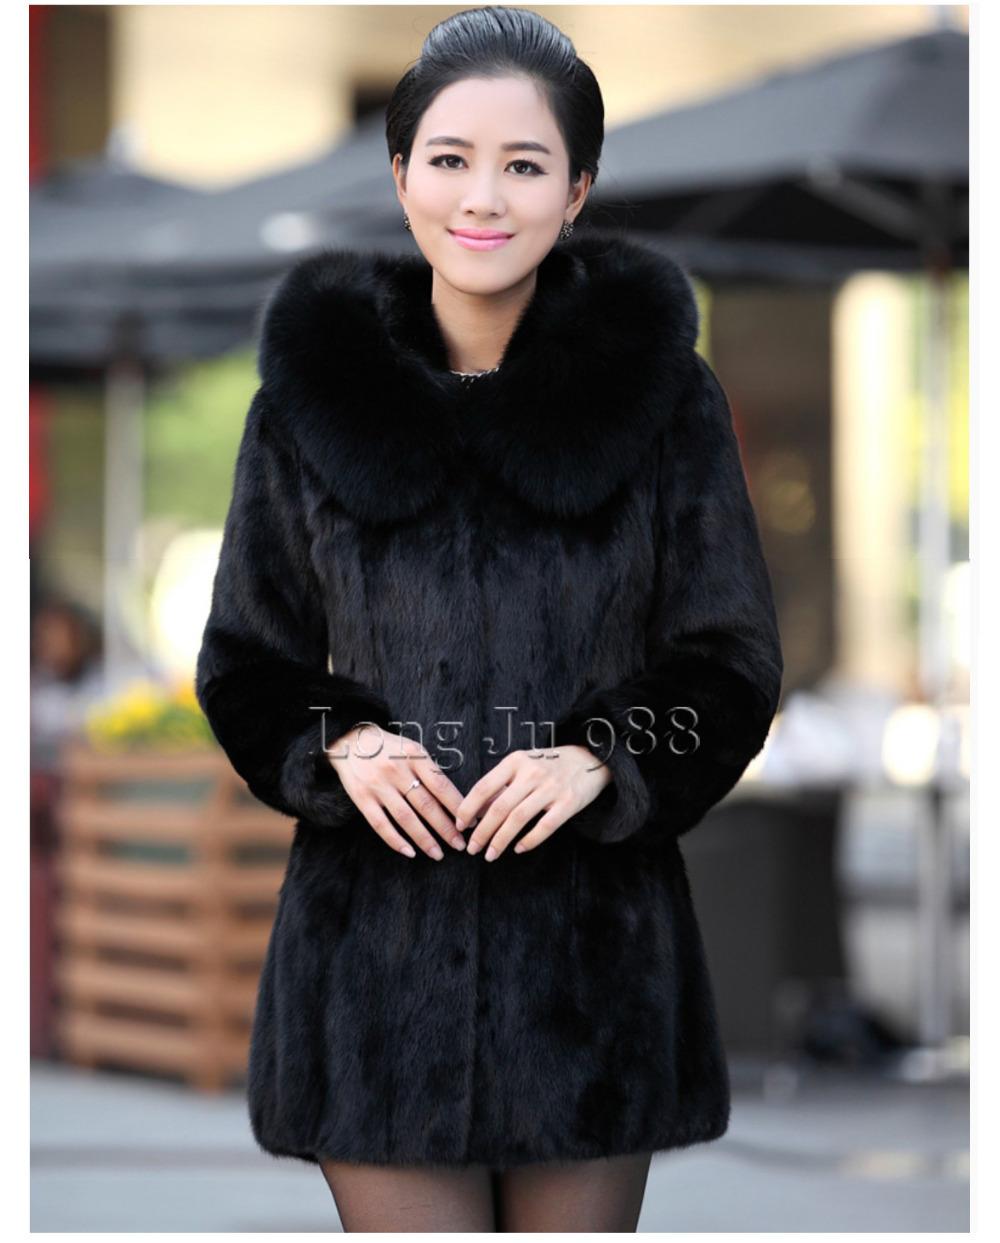 2015 Luxury faux Rabbit fur coat Women winter Fashion Hooded FoxFur Collar Medium-long lady Overcoat Elegant - longju988 store